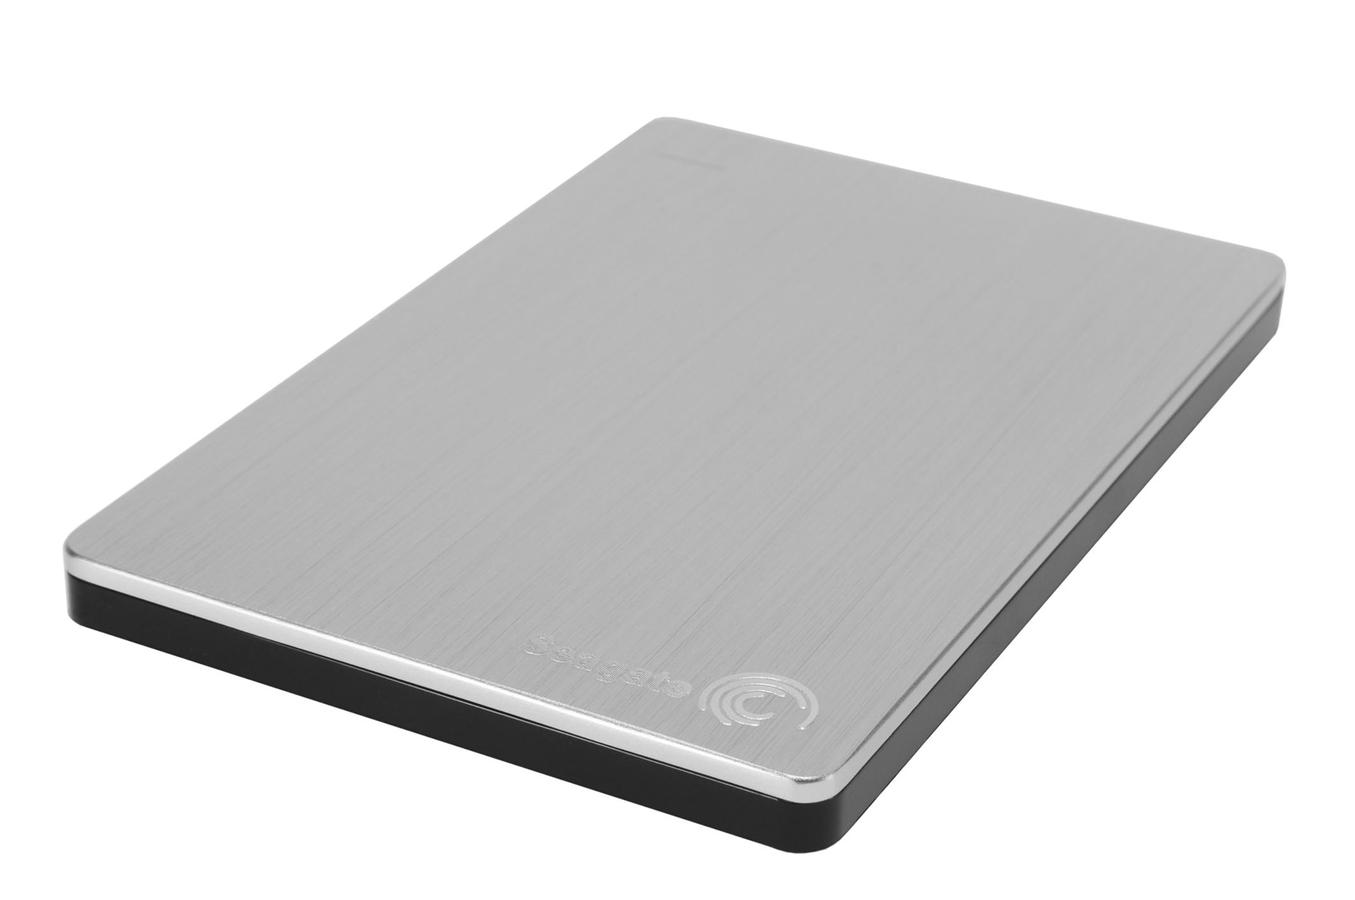 disque dur externe seagate 2 5 500 go slim portable usb 3 0 silver slim portable 1383540. Black Bedroom Furniture Sets. Home Design Ideas